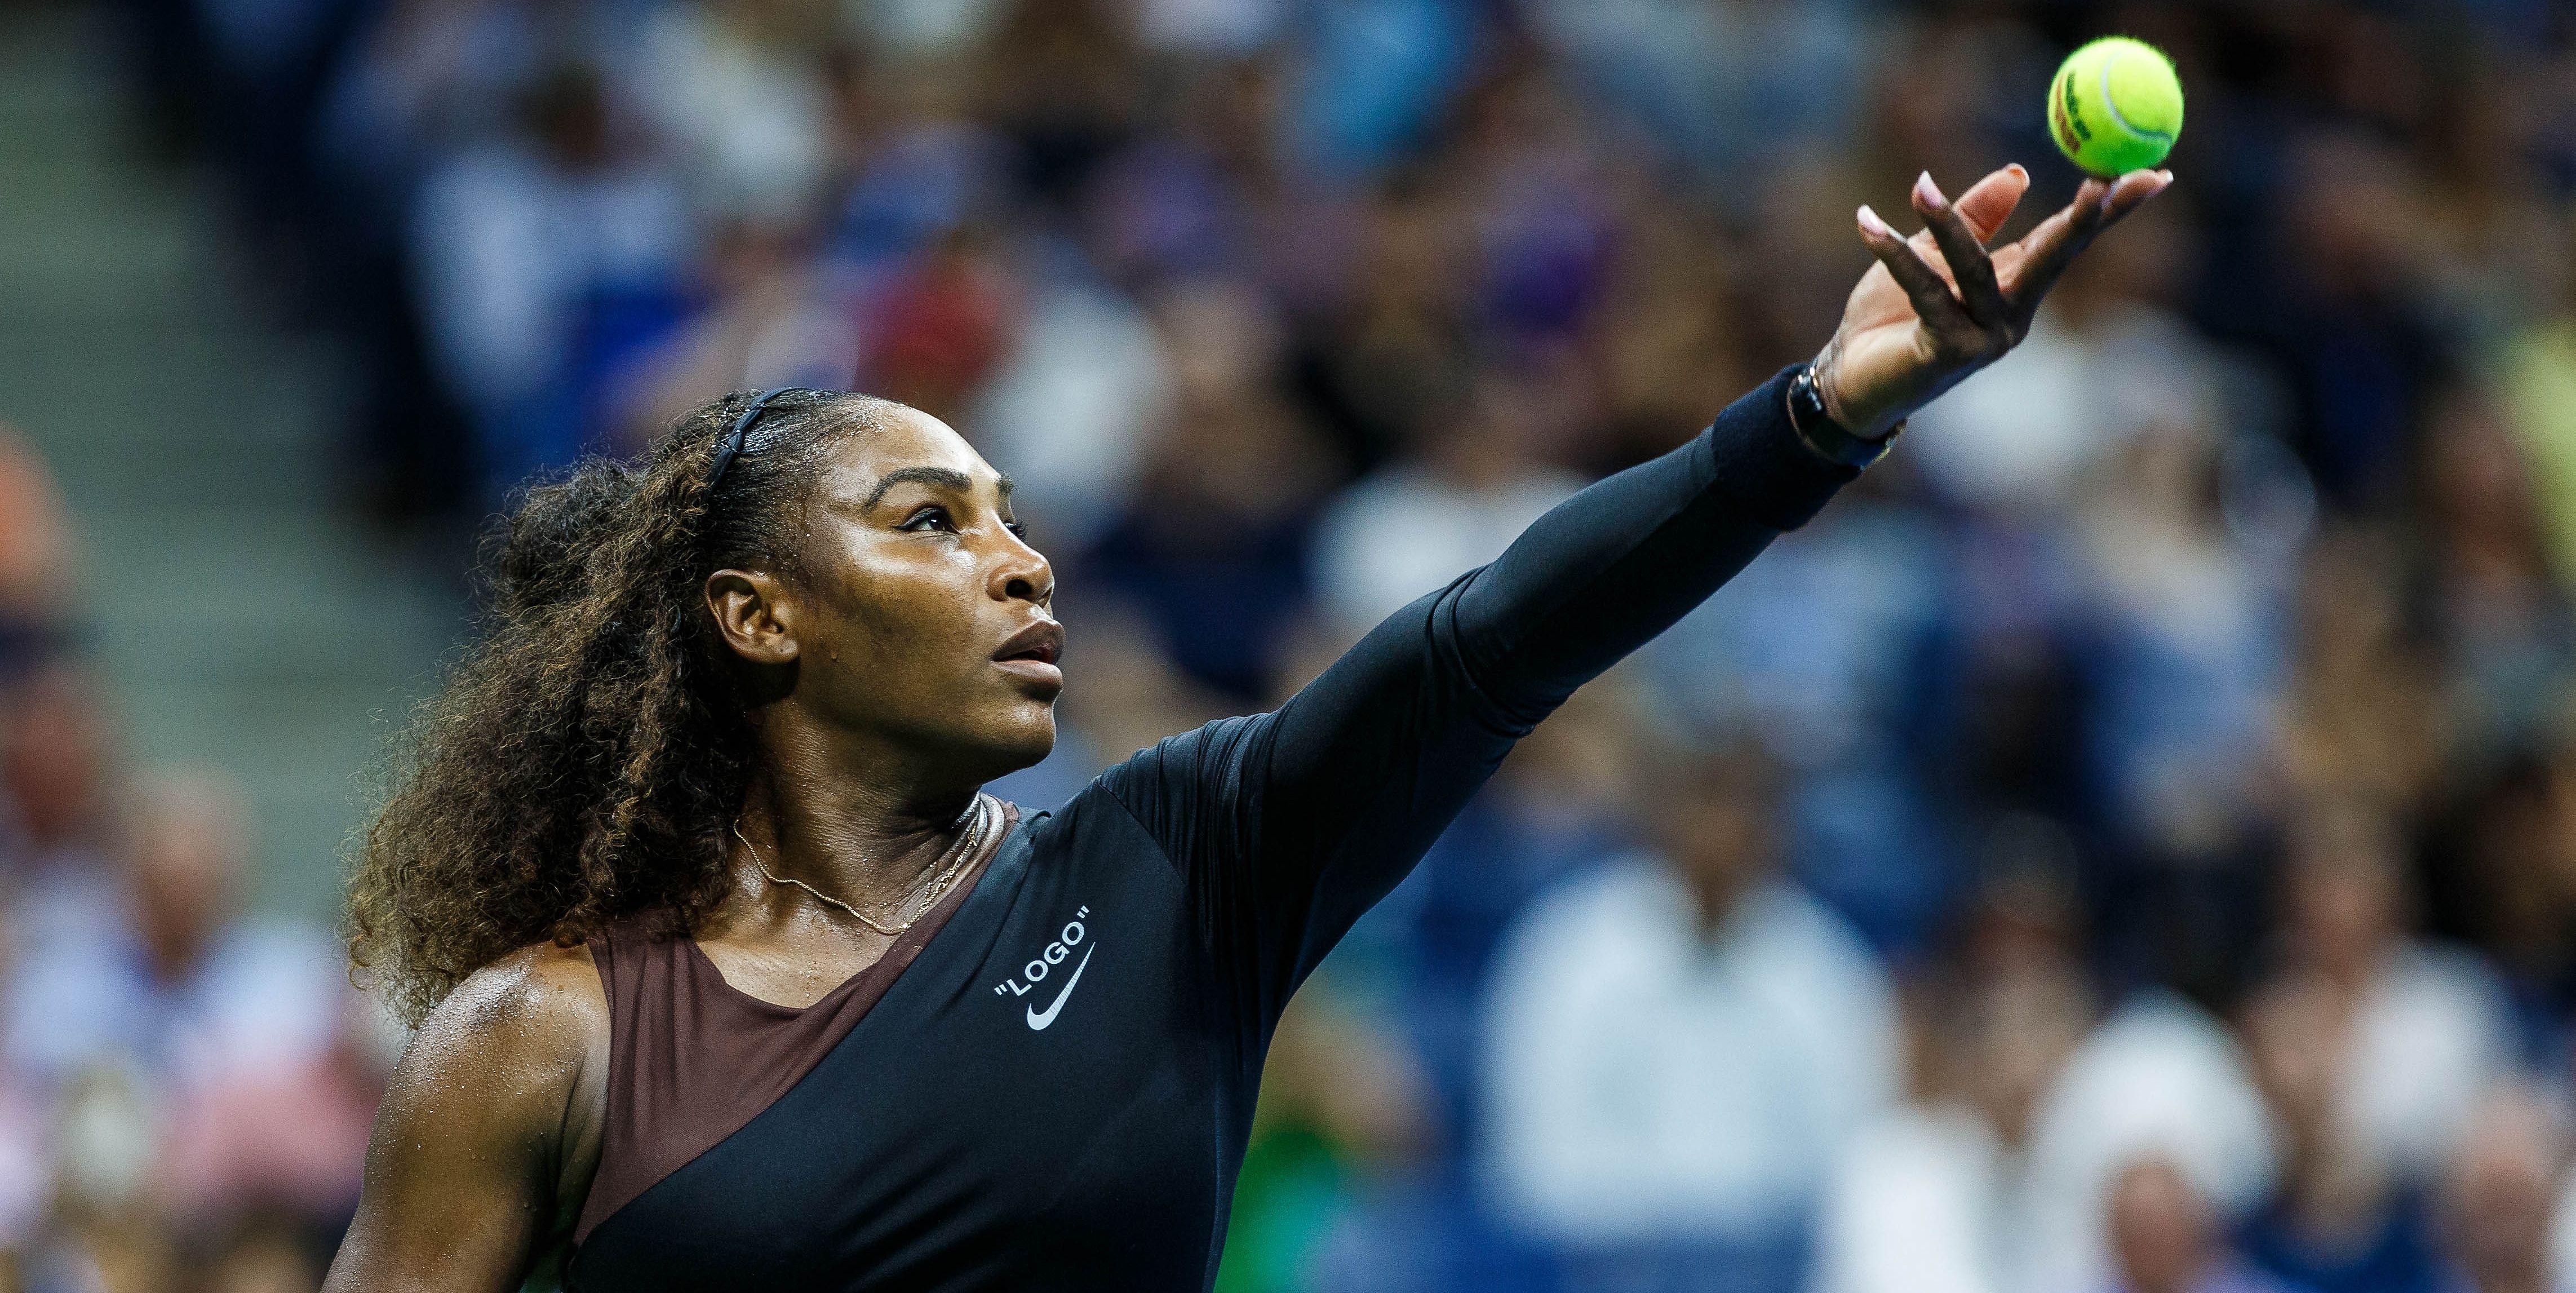 TENNIS: SEP 04 US Open